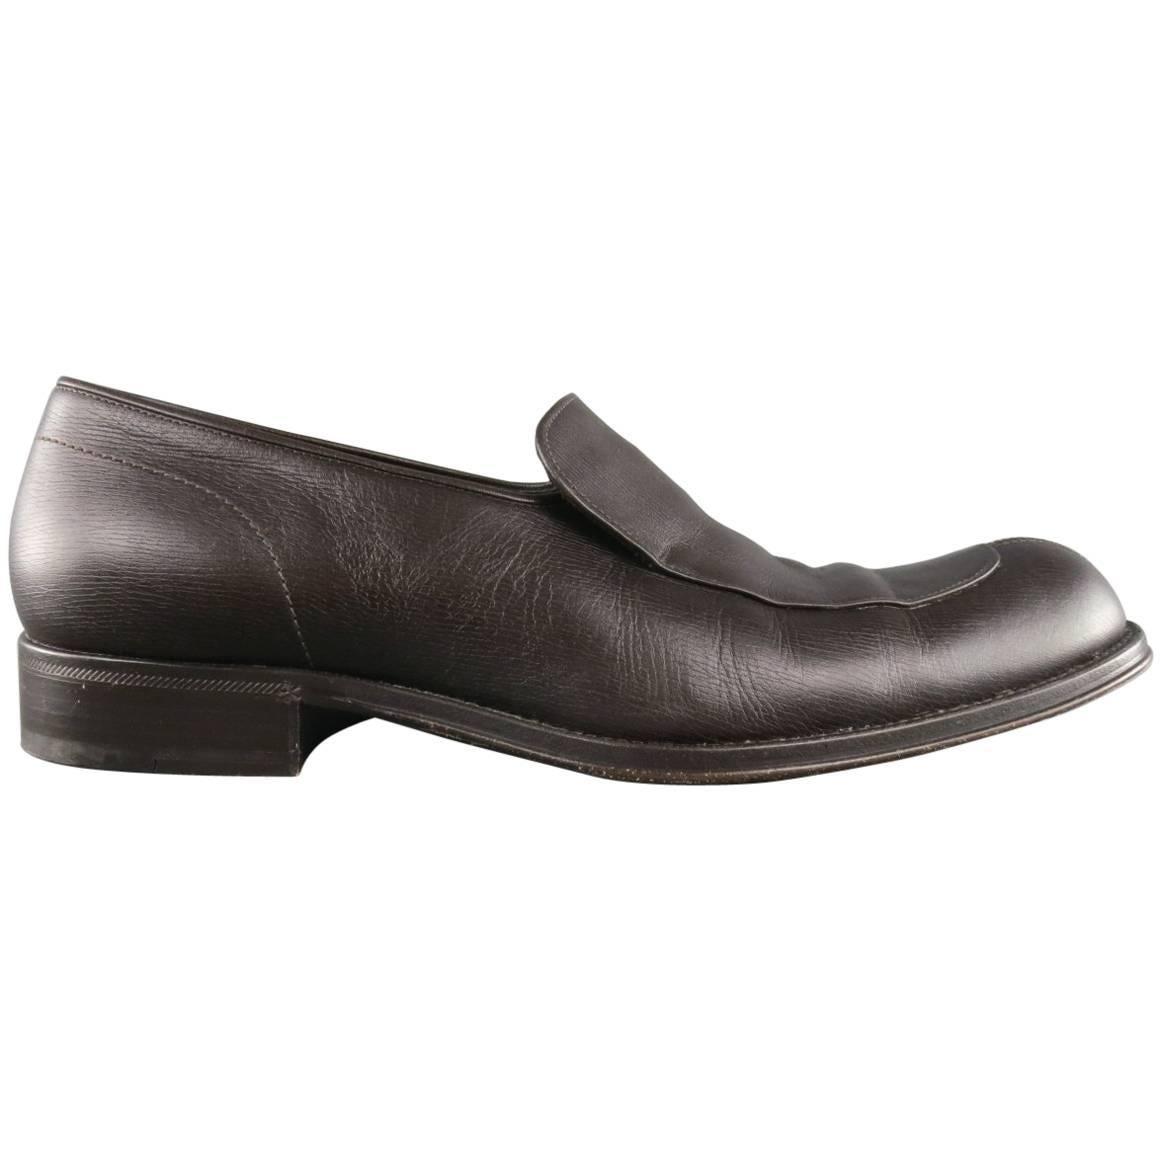 e48bb4e94858 Men s GIORGIO ARMANI Shoes - Size 9.5 Brown Leather Split Apron Toe Loafers  For Sale at 1stdibs